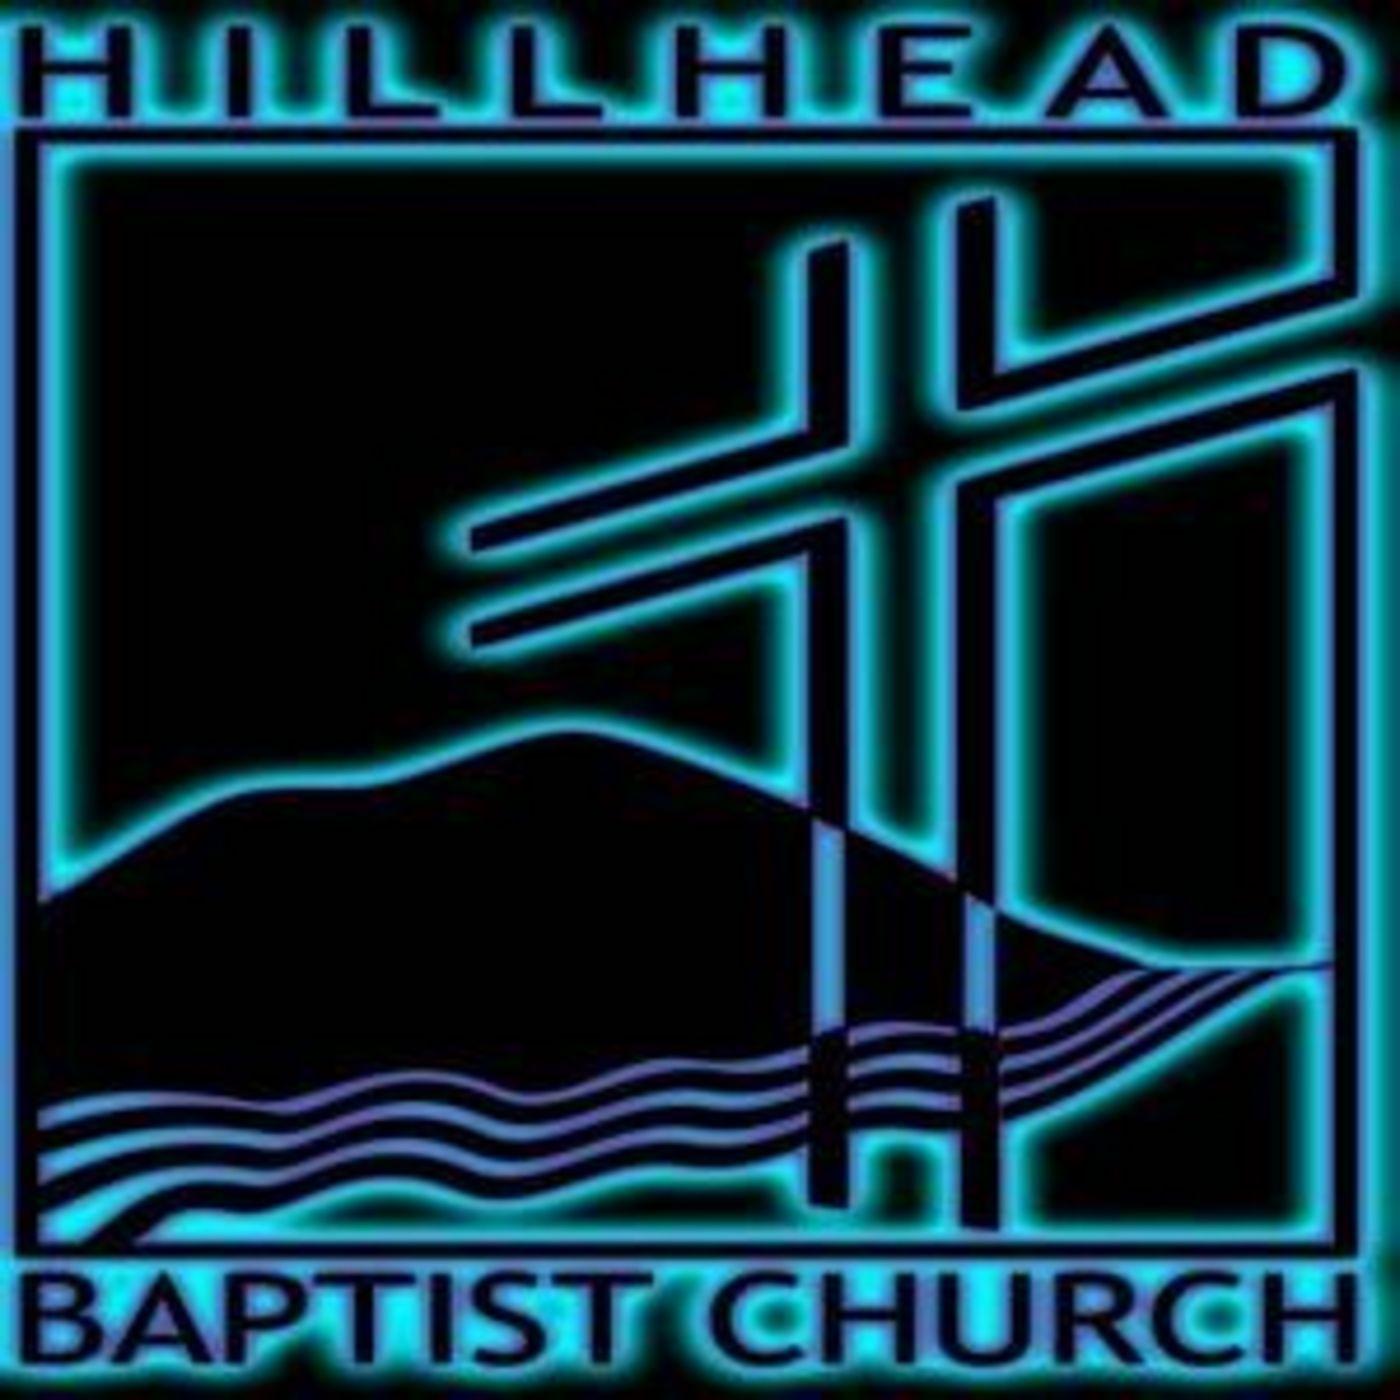 <![CDATA[Hillhead Baptist Church]]>